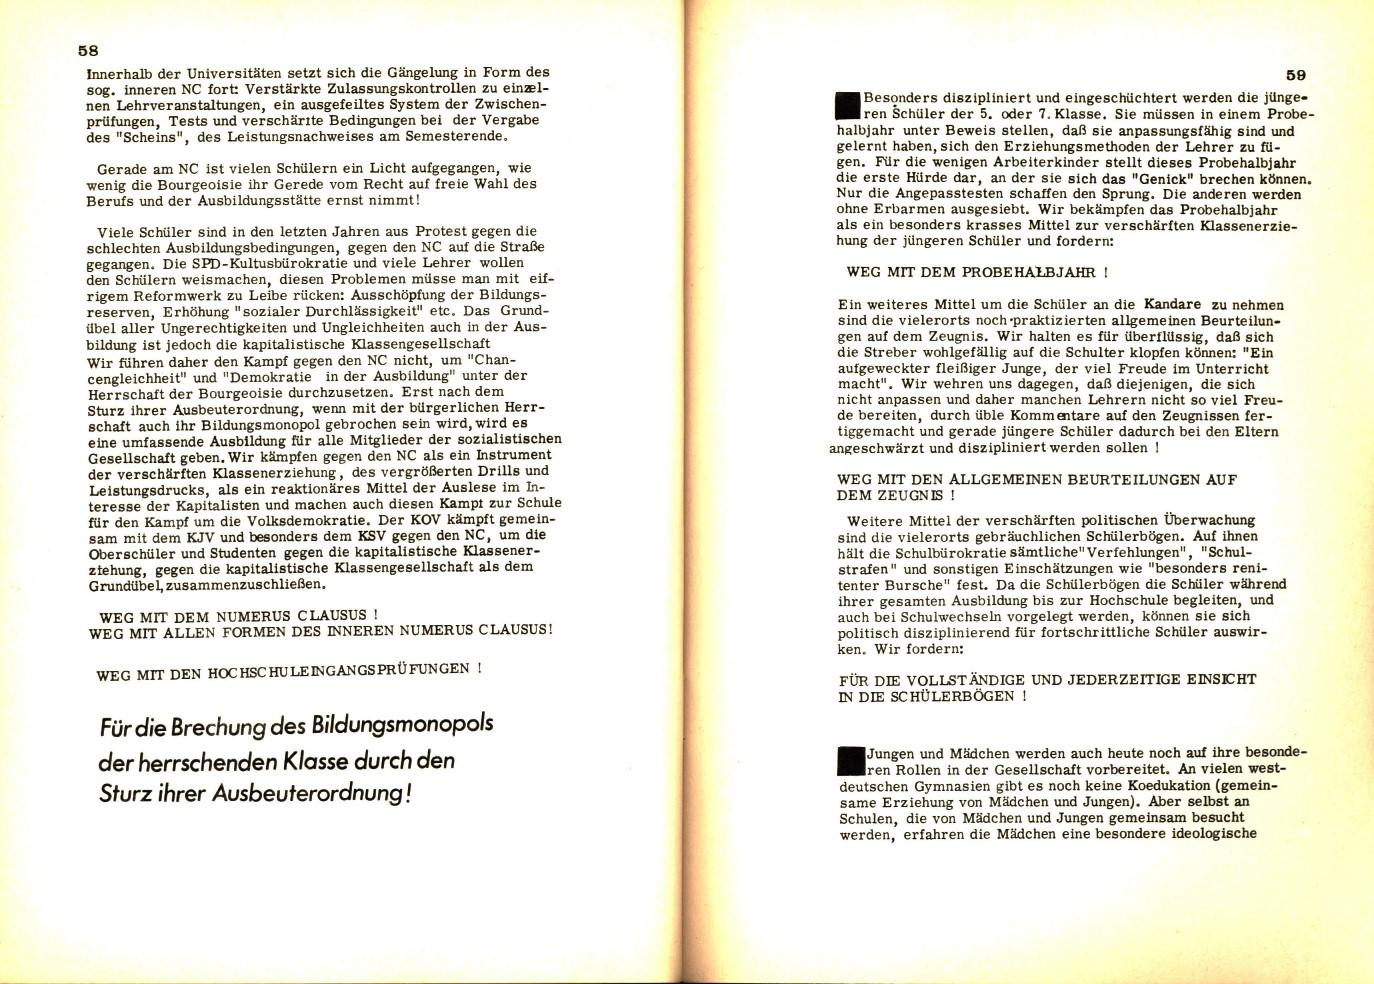 KOV_1973_Aktionsprogramm_32